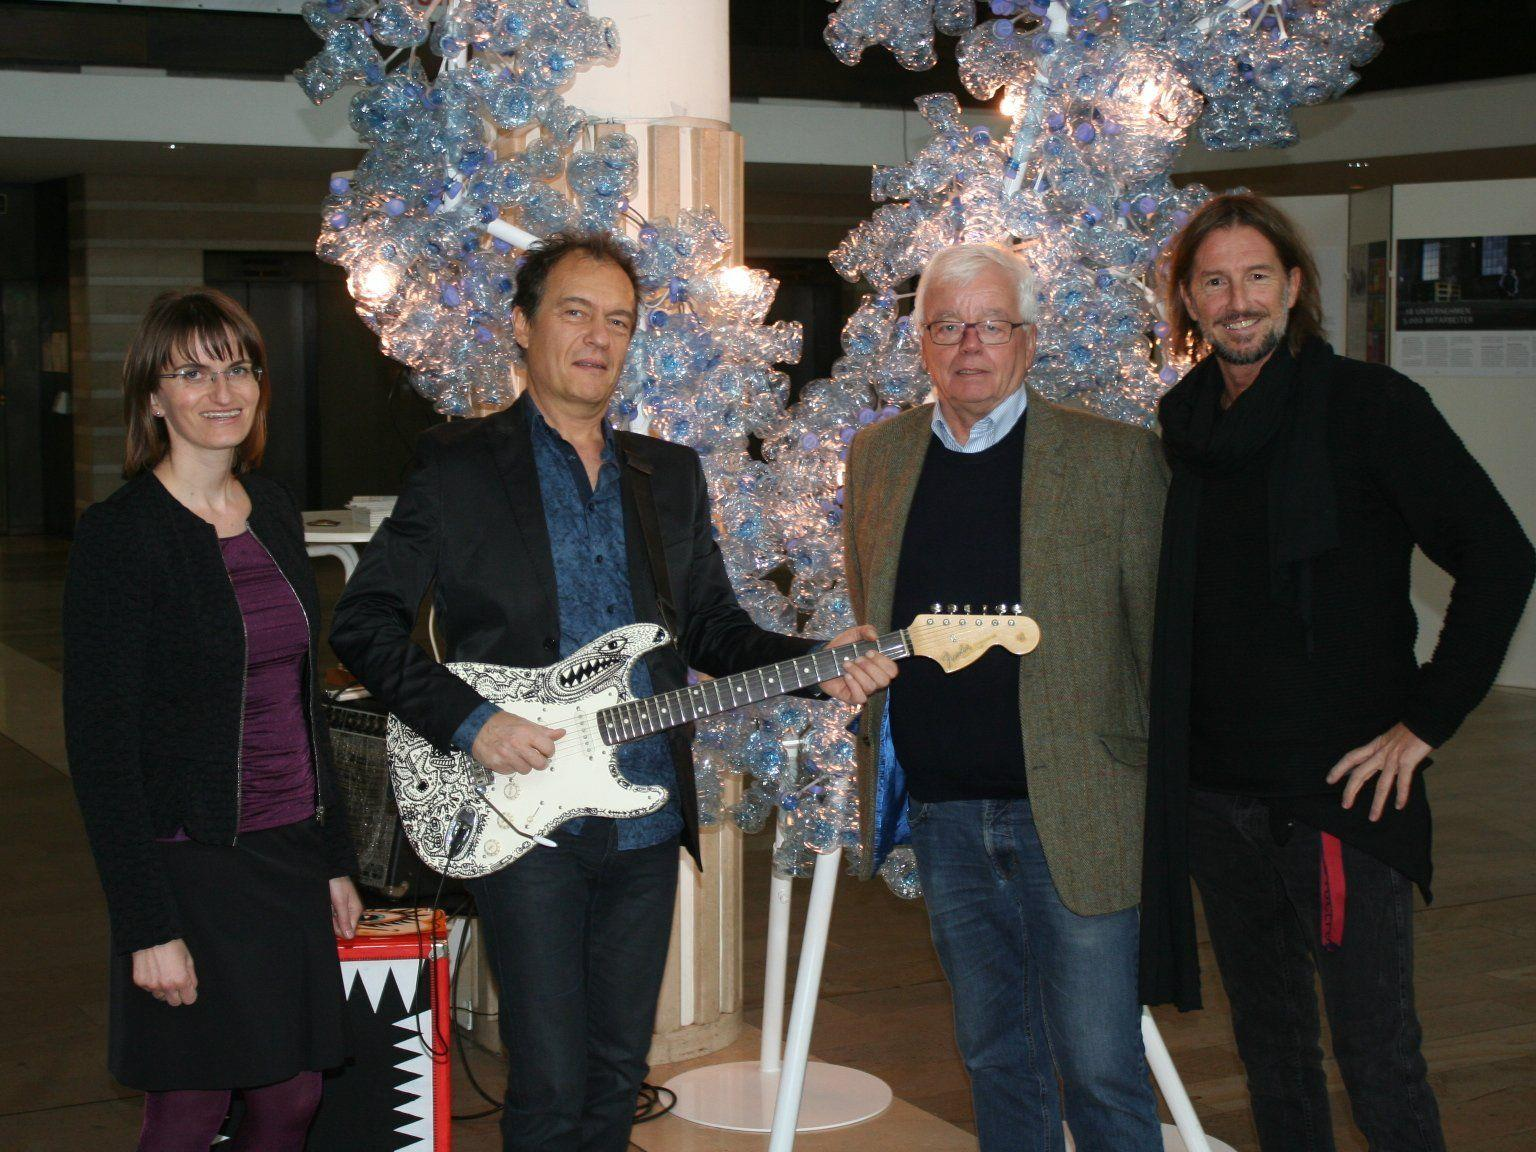 Friederike Hehle, Charly Bonat, Martin Rhomberg, Ferenc Chlumetzky